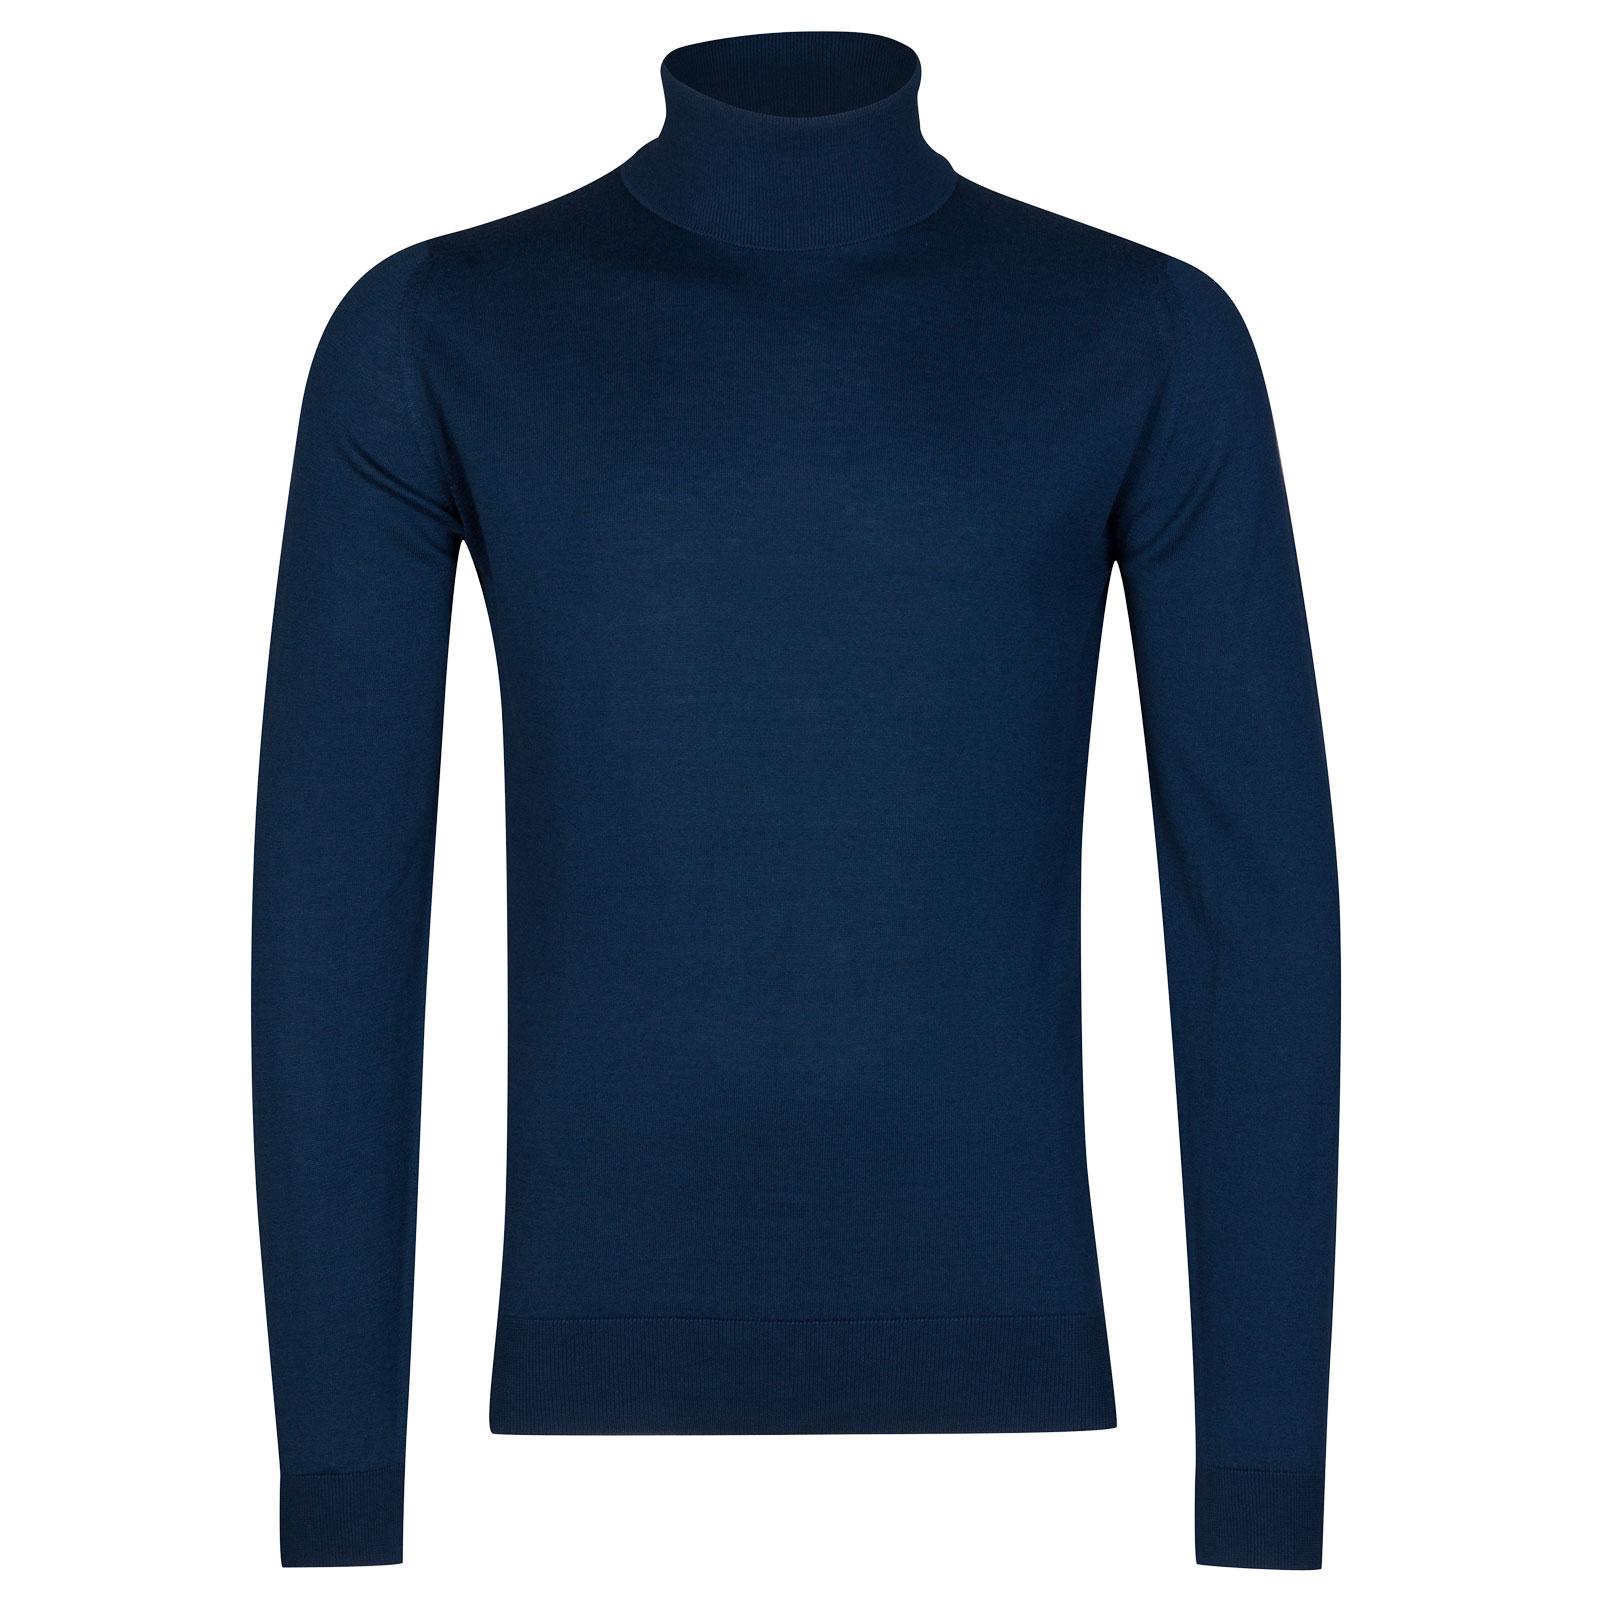 John Smedley Hawley Sea Island Cotton Pullover in Indigo-XL